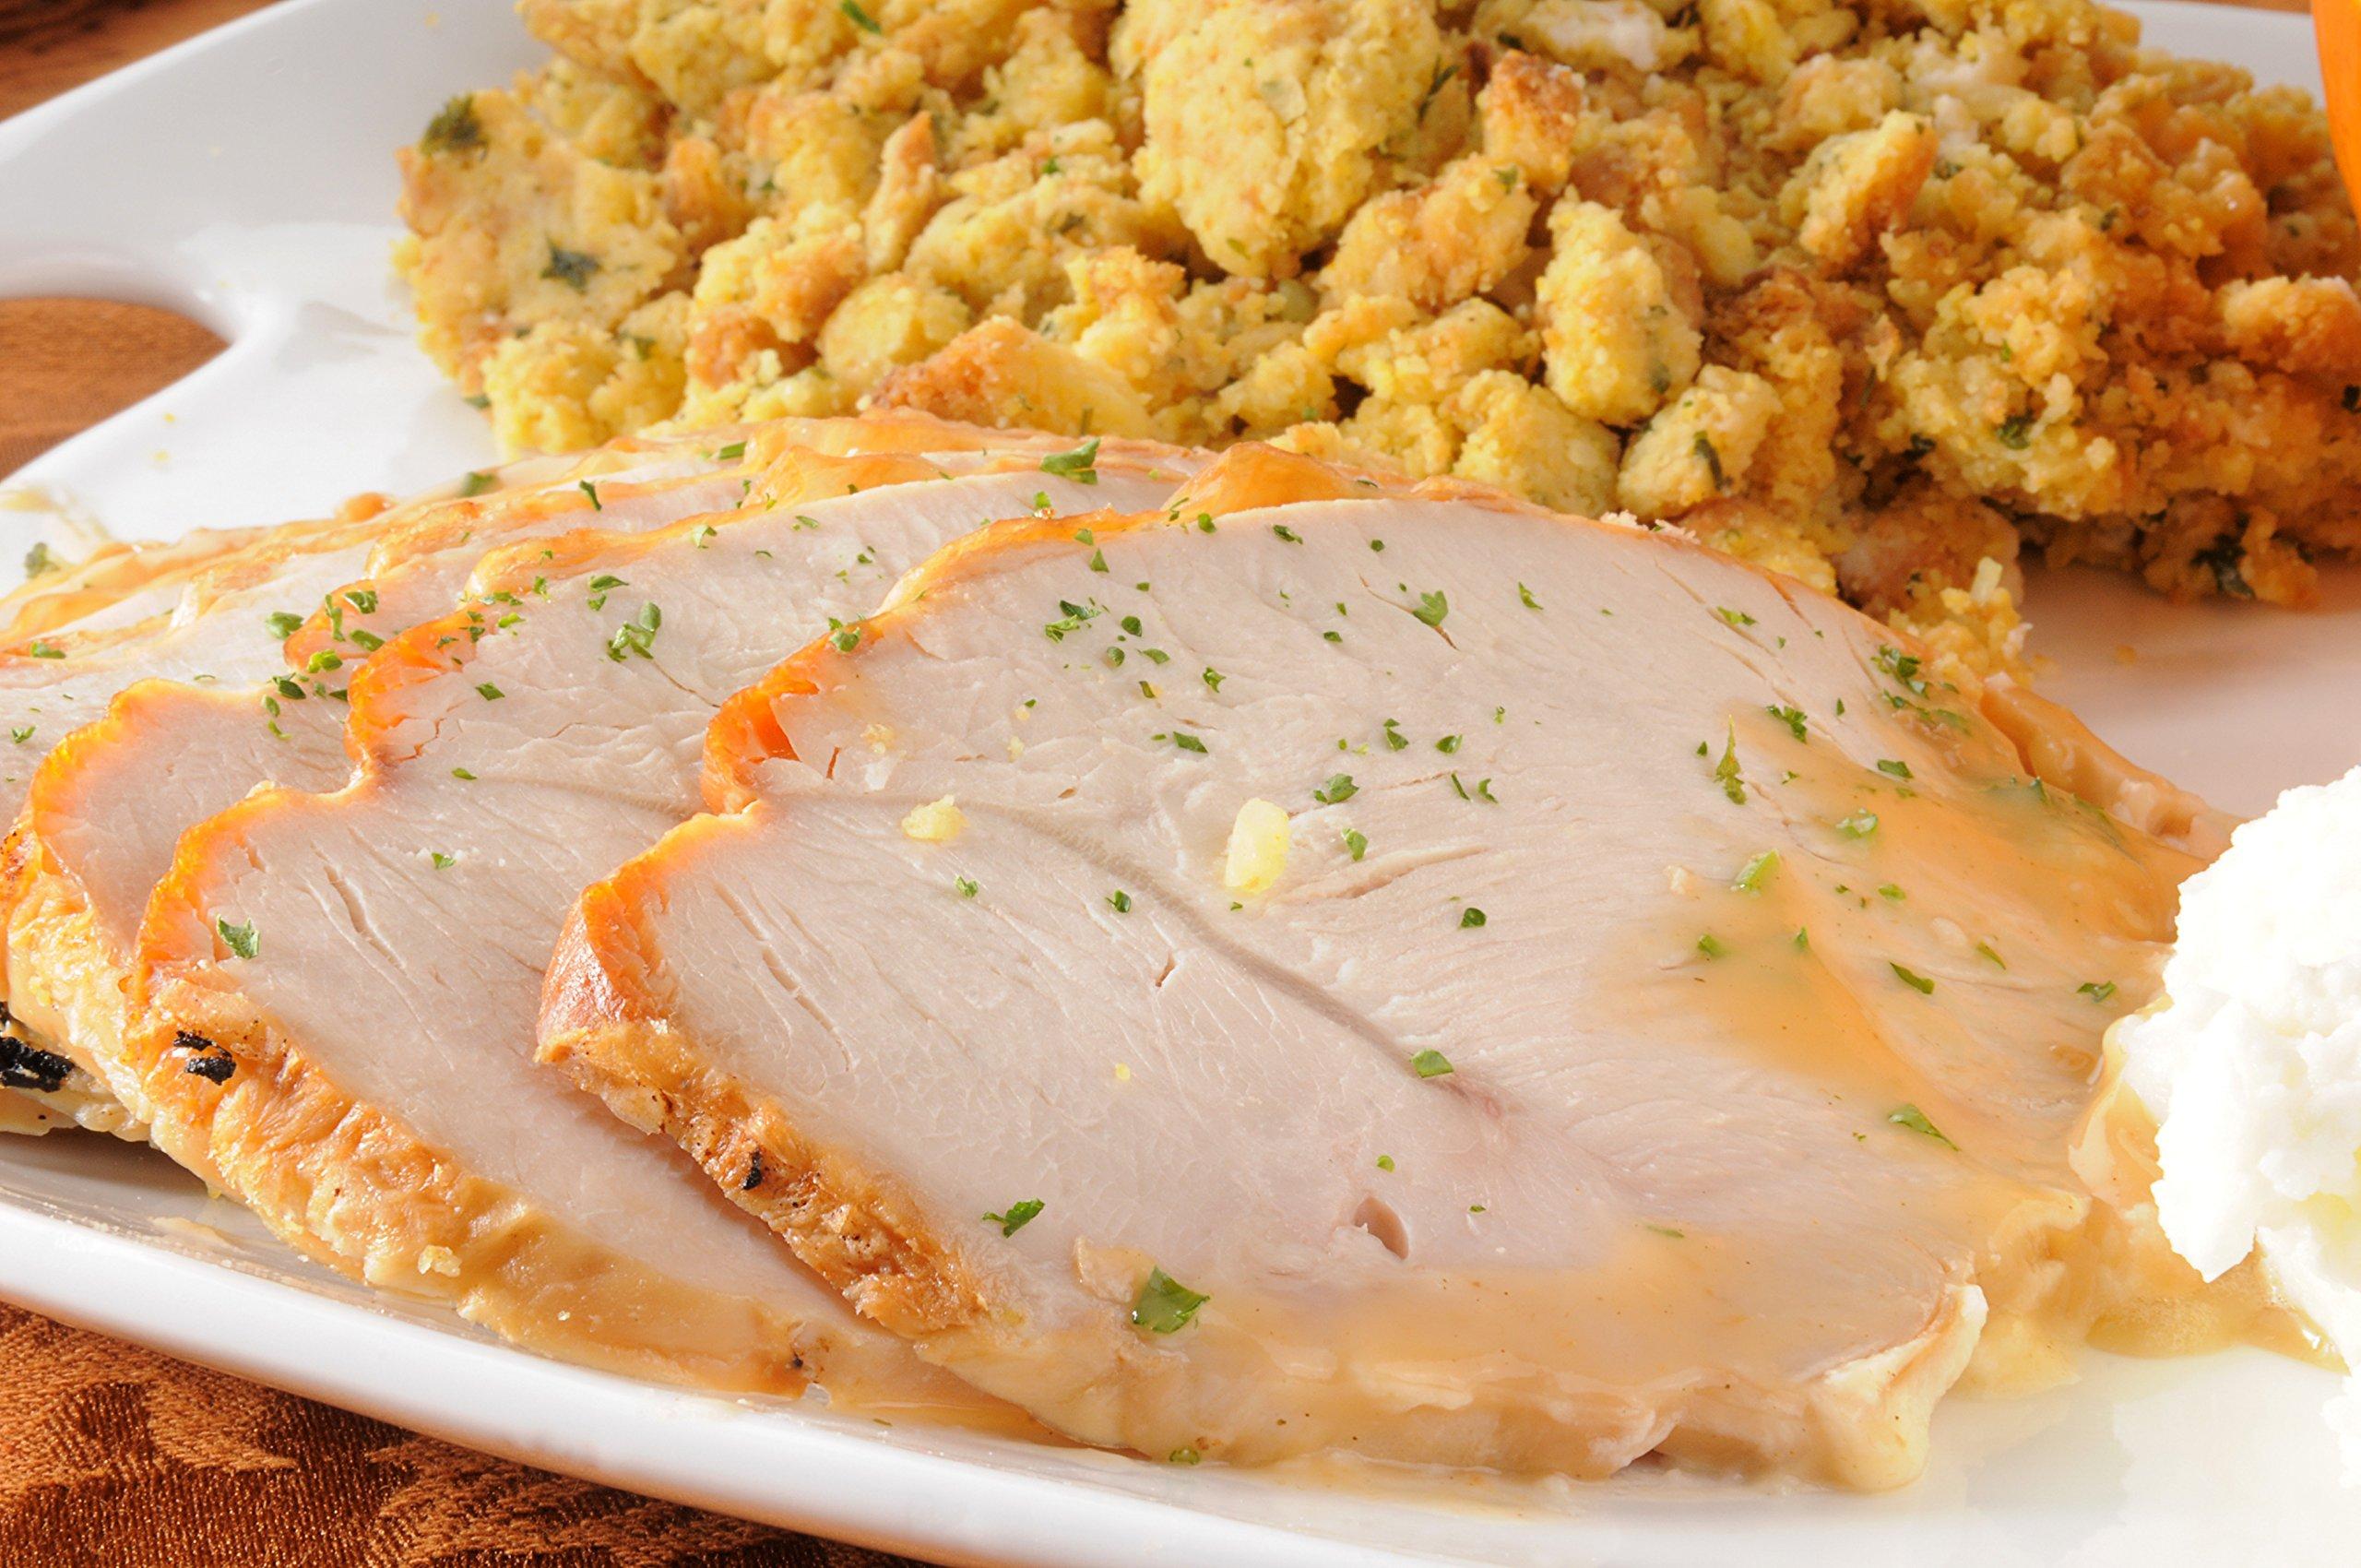 Kosher Sweet and Complete Turkey Dinner